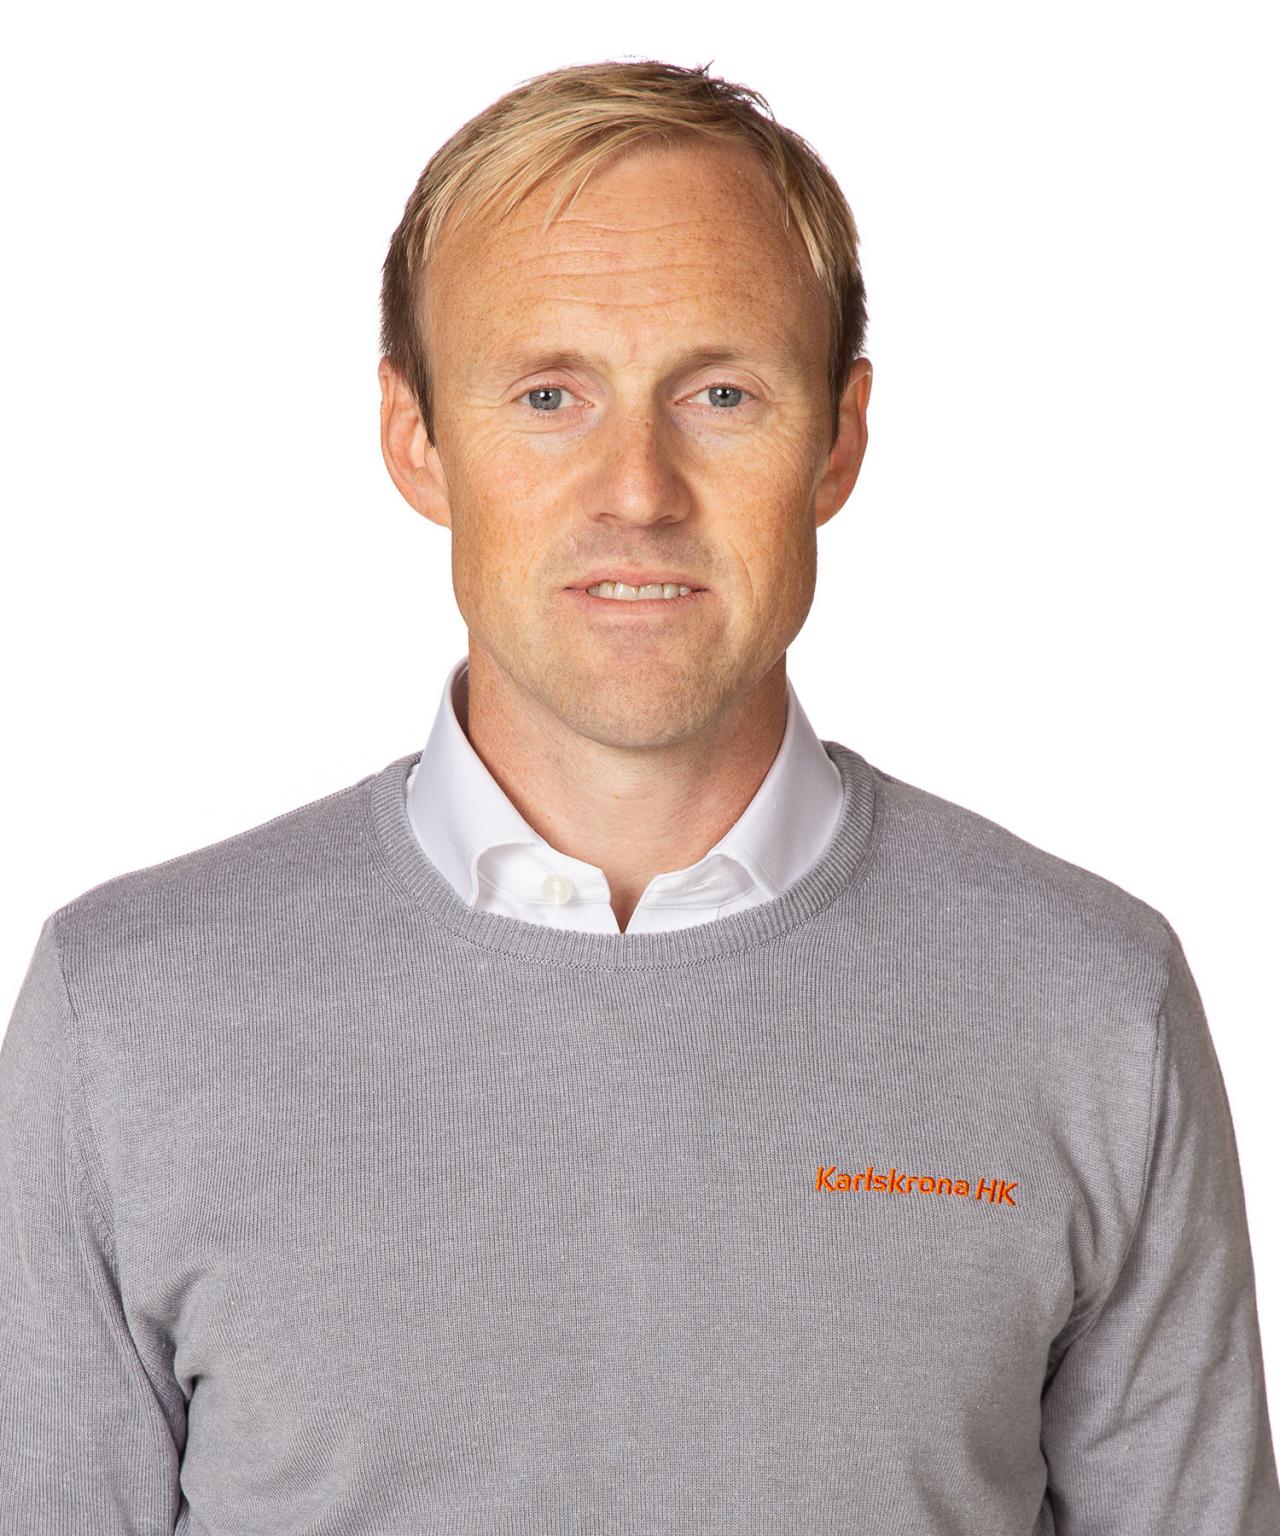 Christian Magnusson